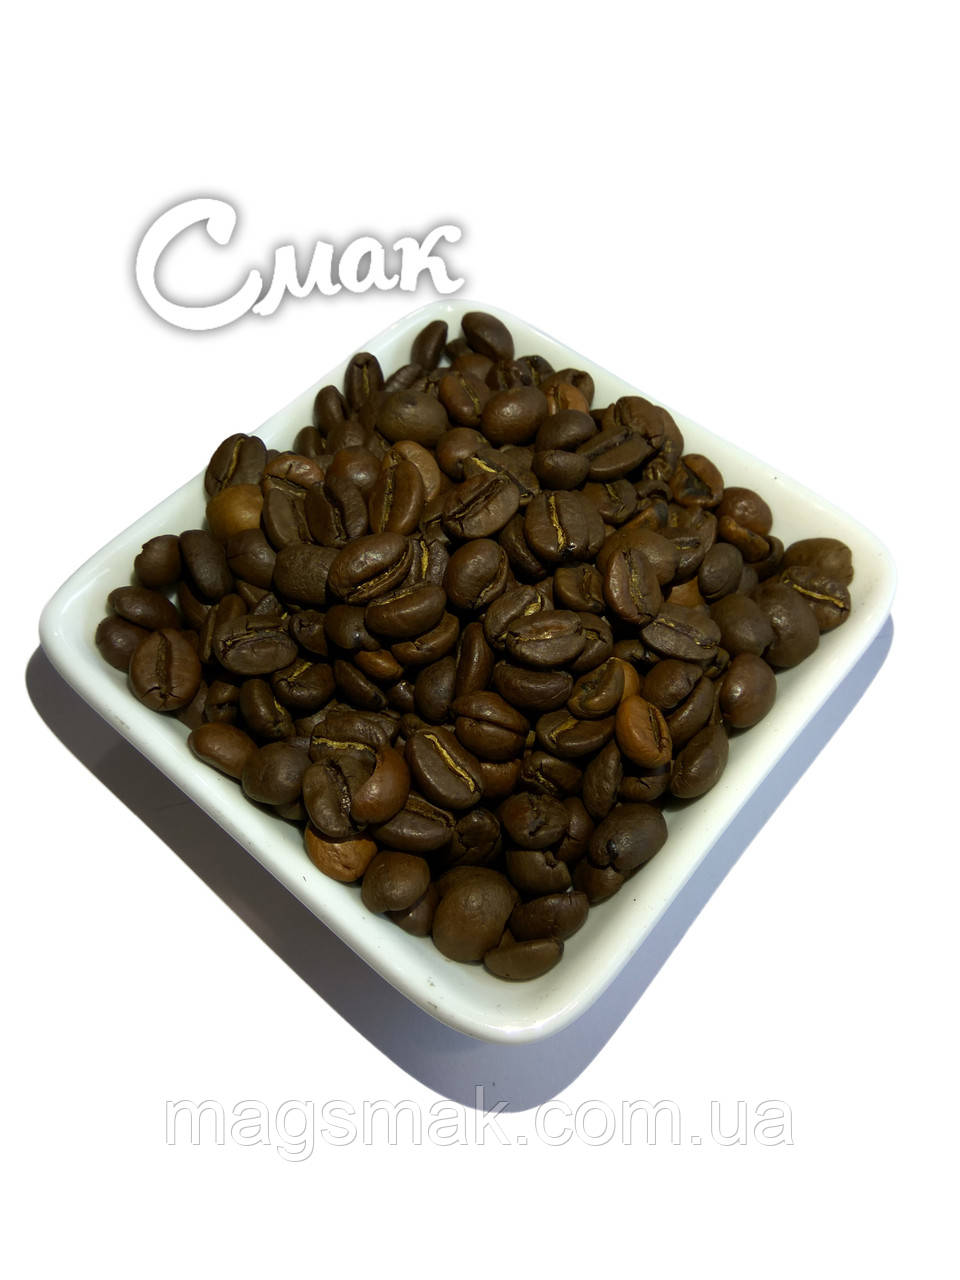 Кофе в зёрнах PREMIUM BLEND, на вес